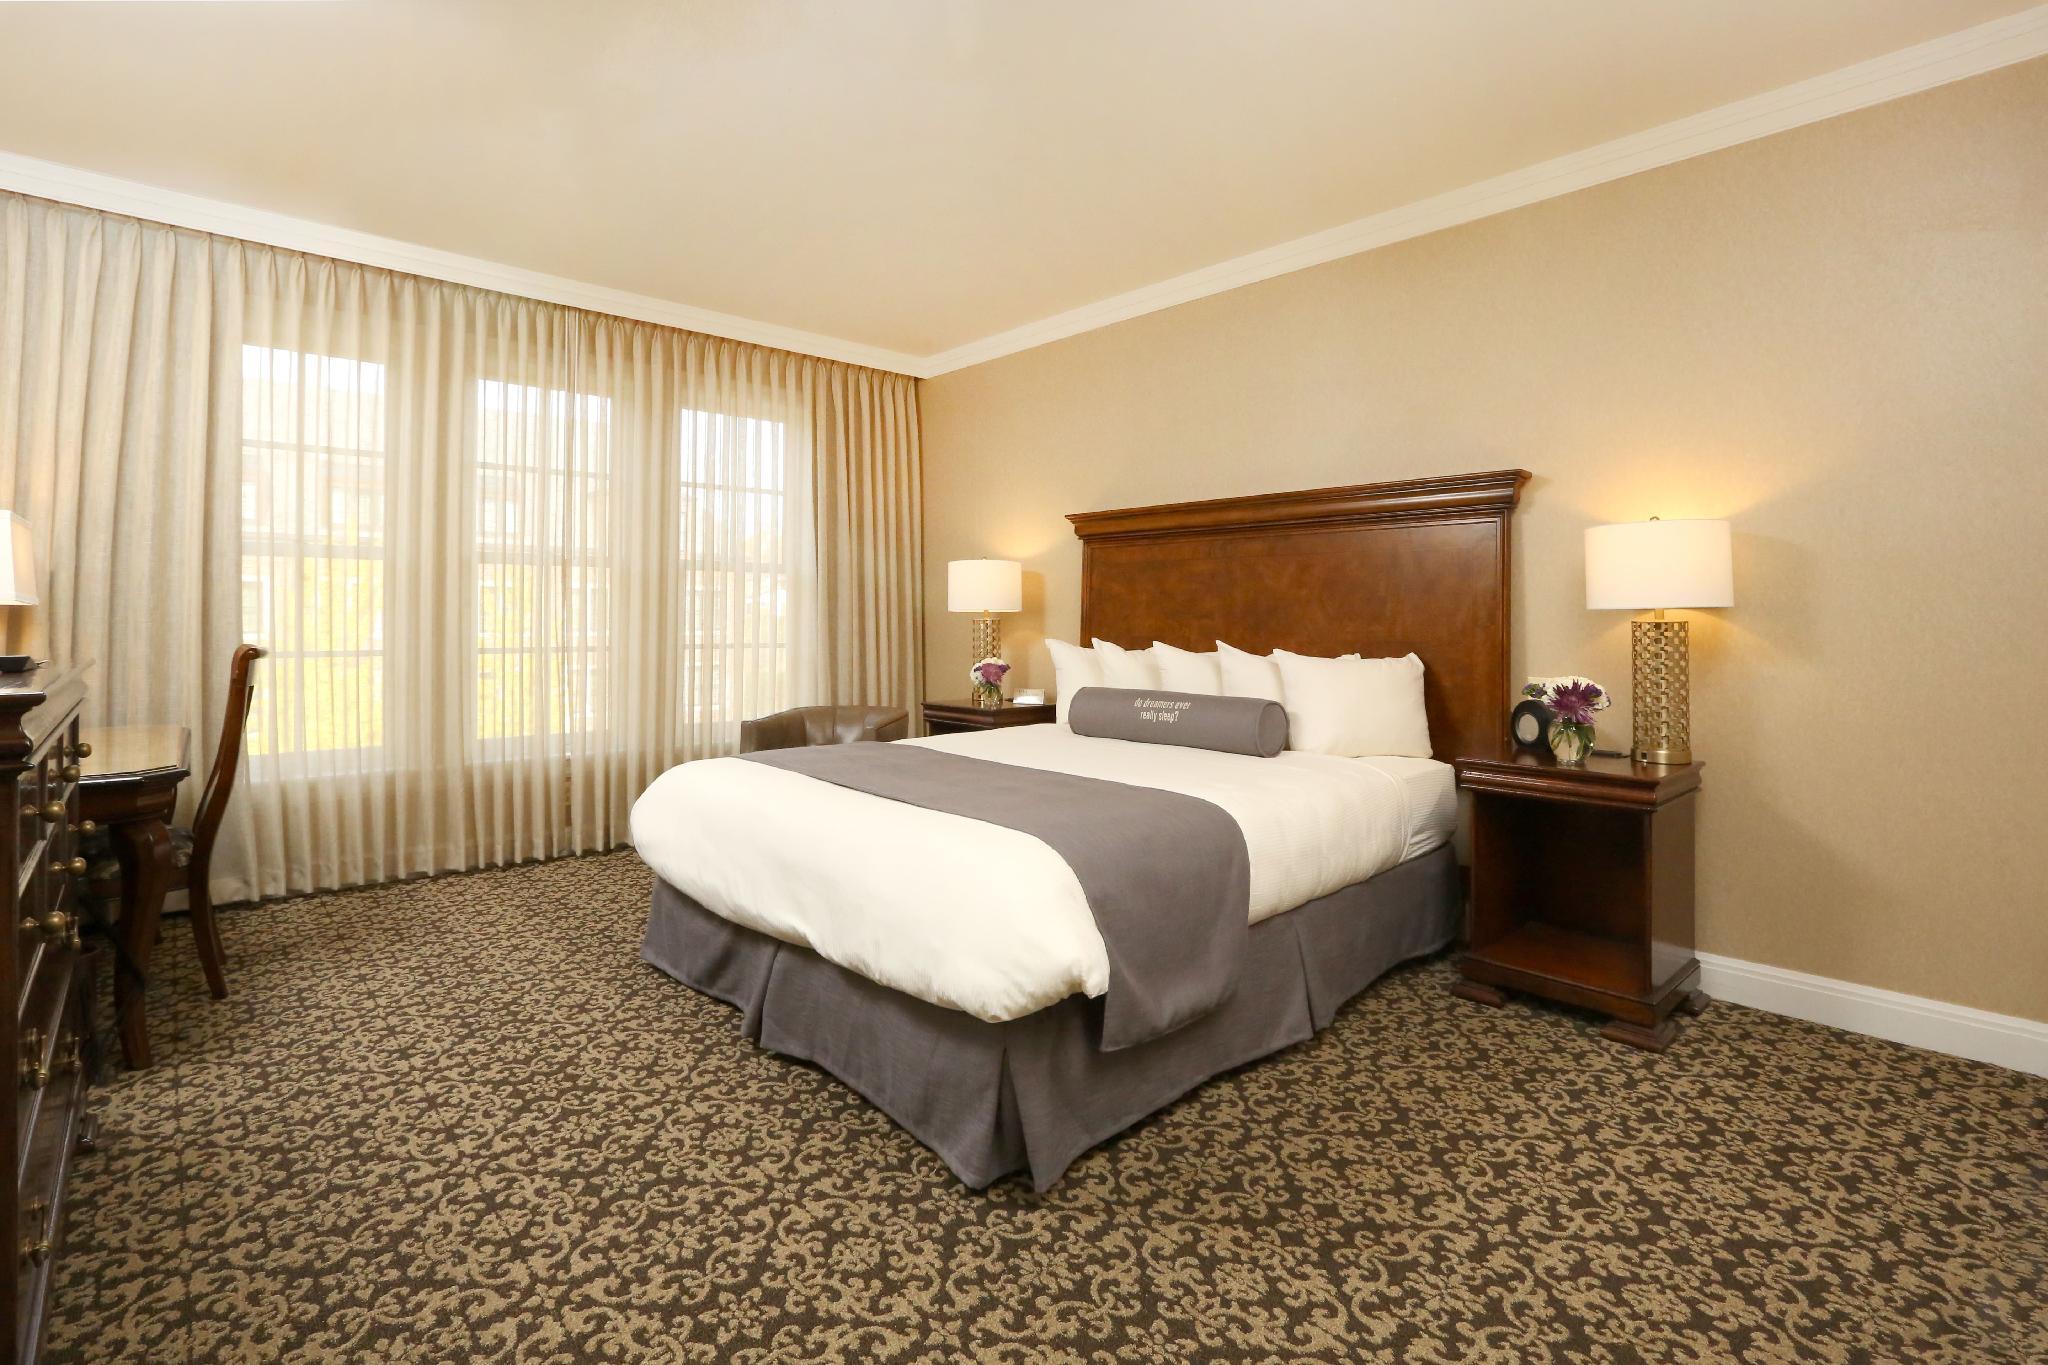 Royal Park Hotel Rochester Mi Booking Deals Photos Reviews